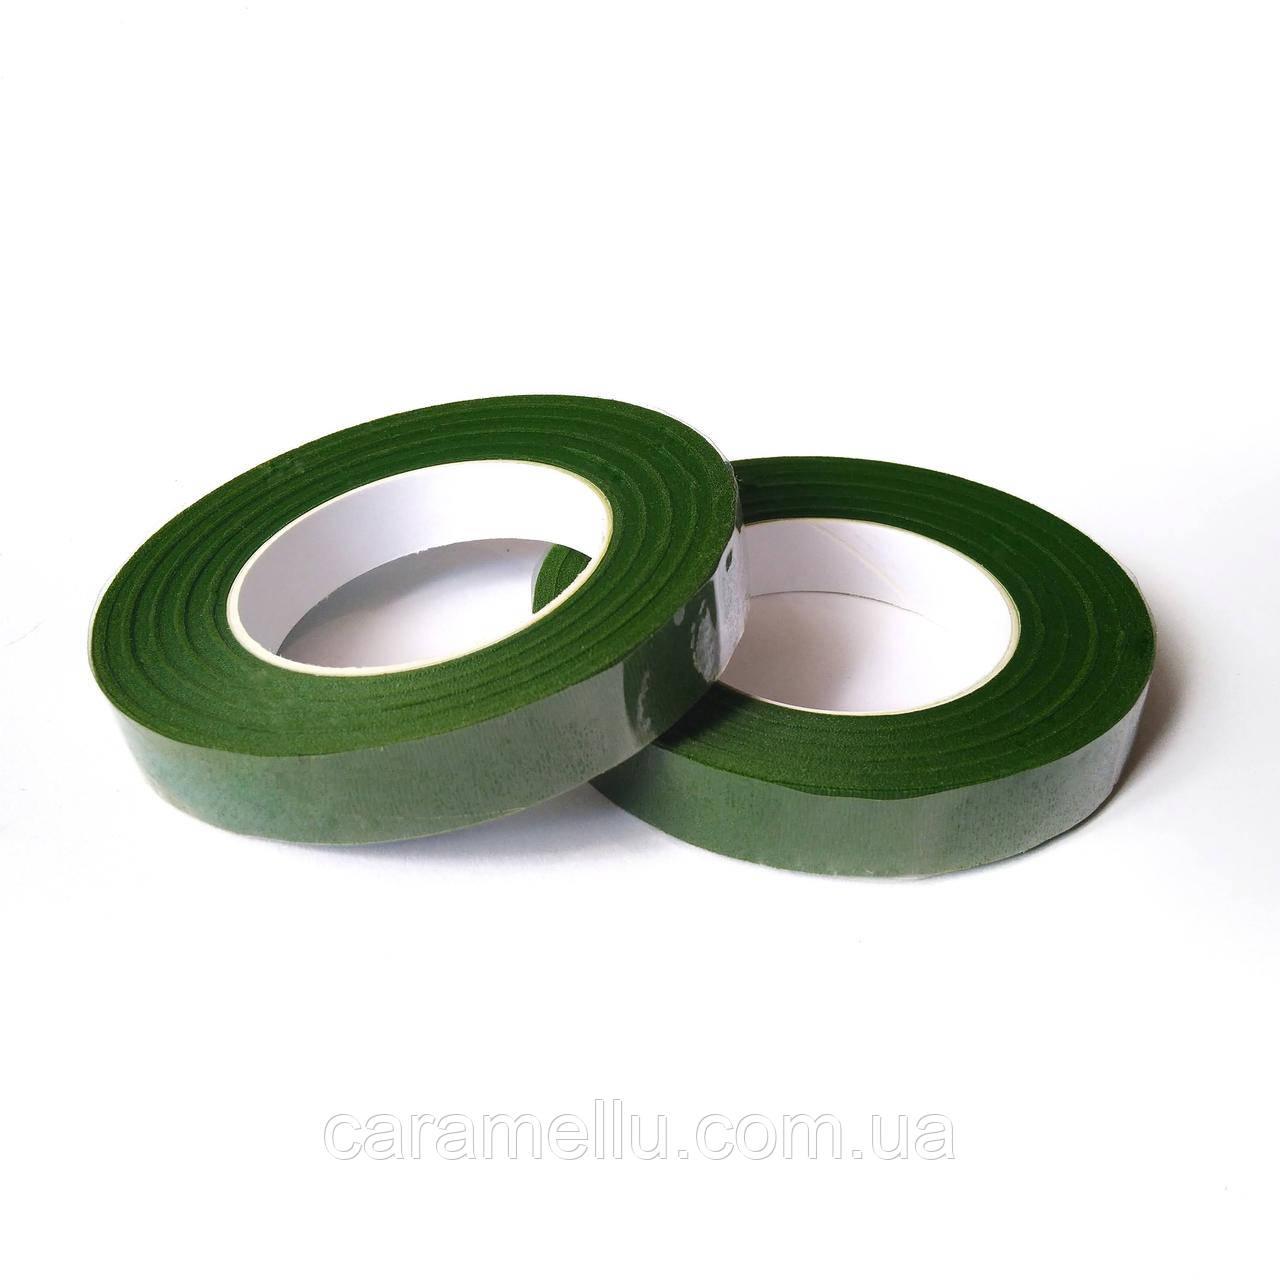 Тейп-лента зеленая. 27м